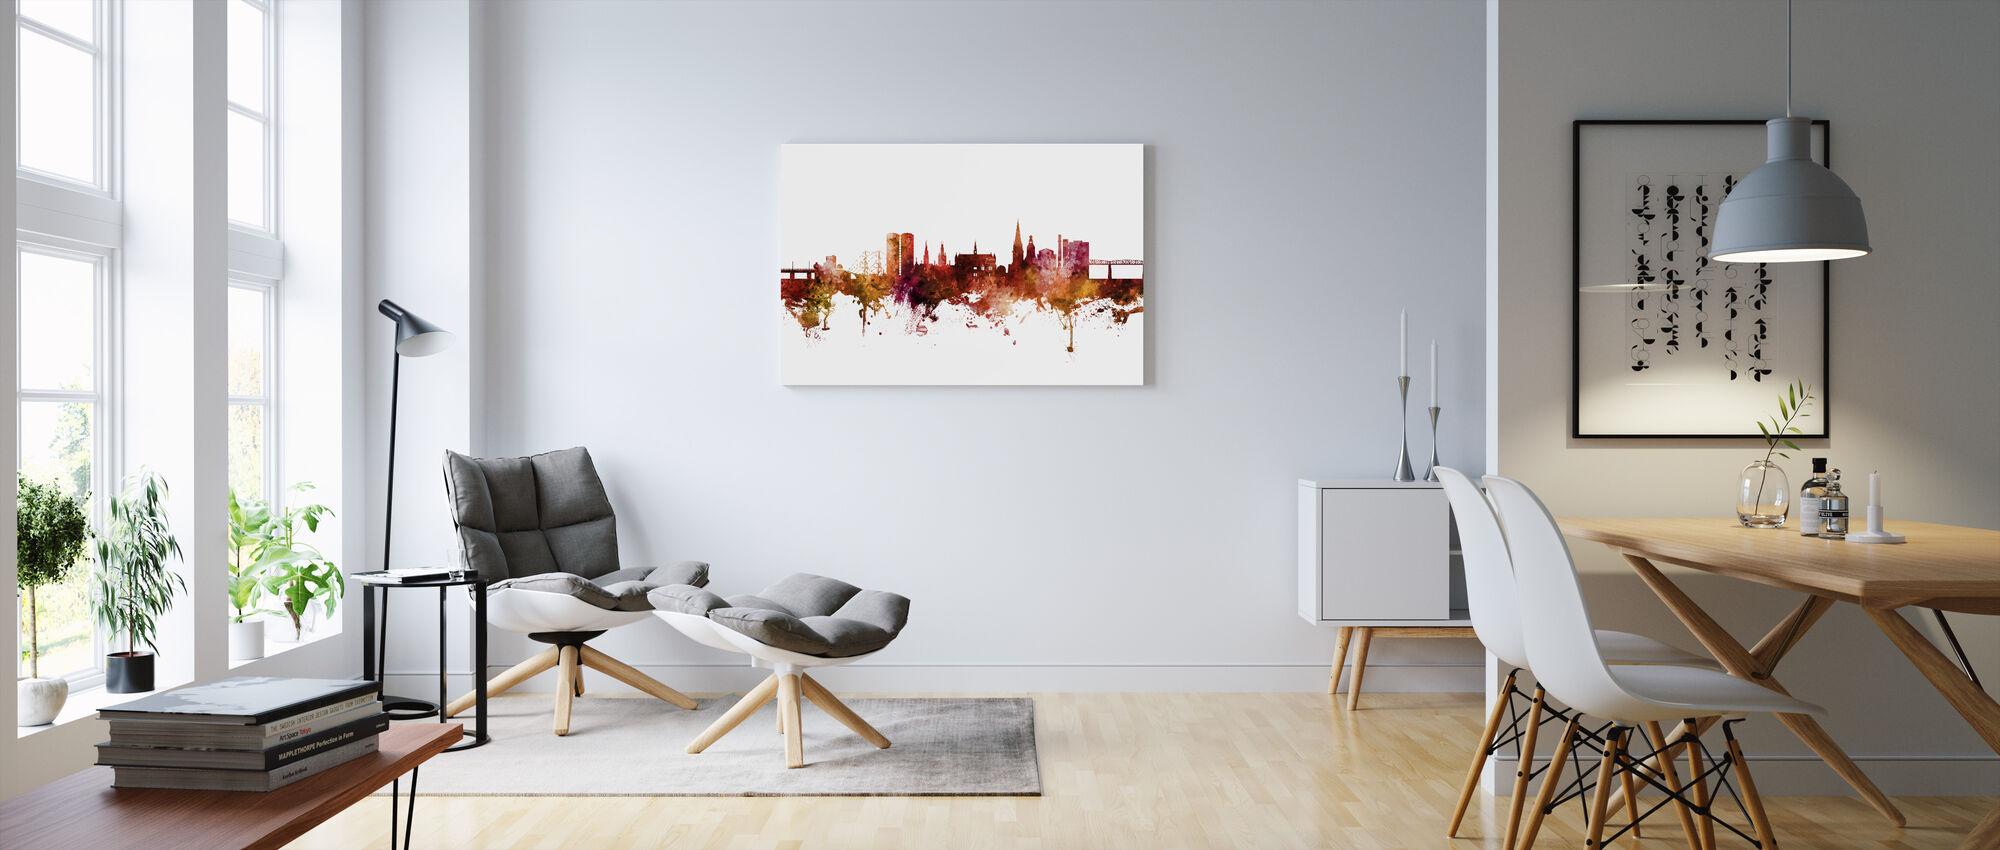 Dundee Scotland Skyline - Canvas print - Living Room